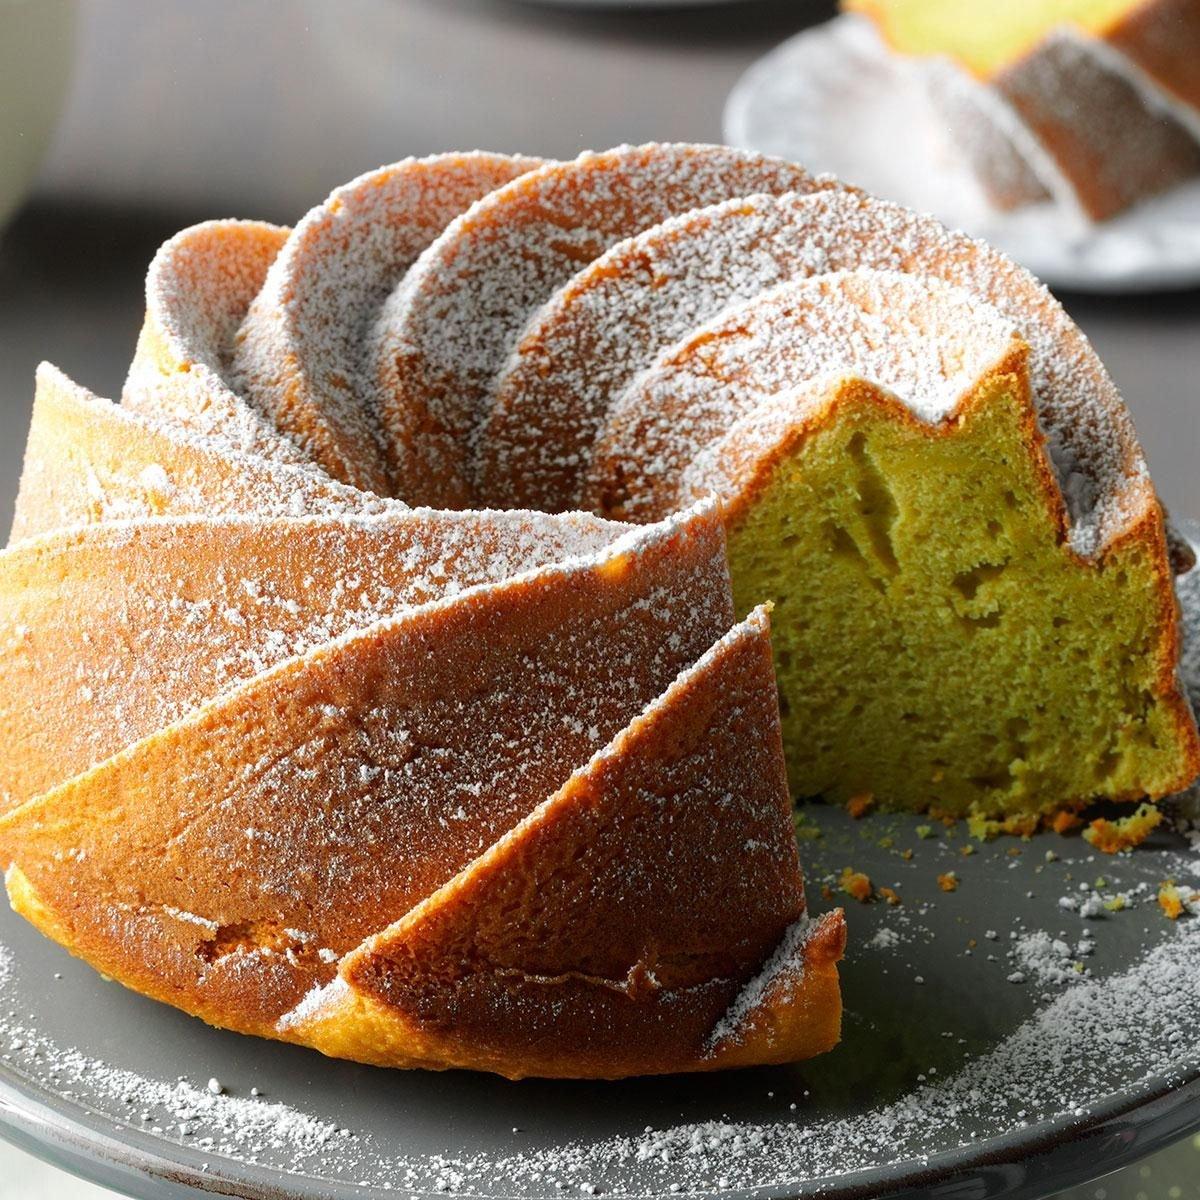 Cake Desserts Pictures Recipes : Easy Pistachio Bundt Cake Recipe Taste of Home